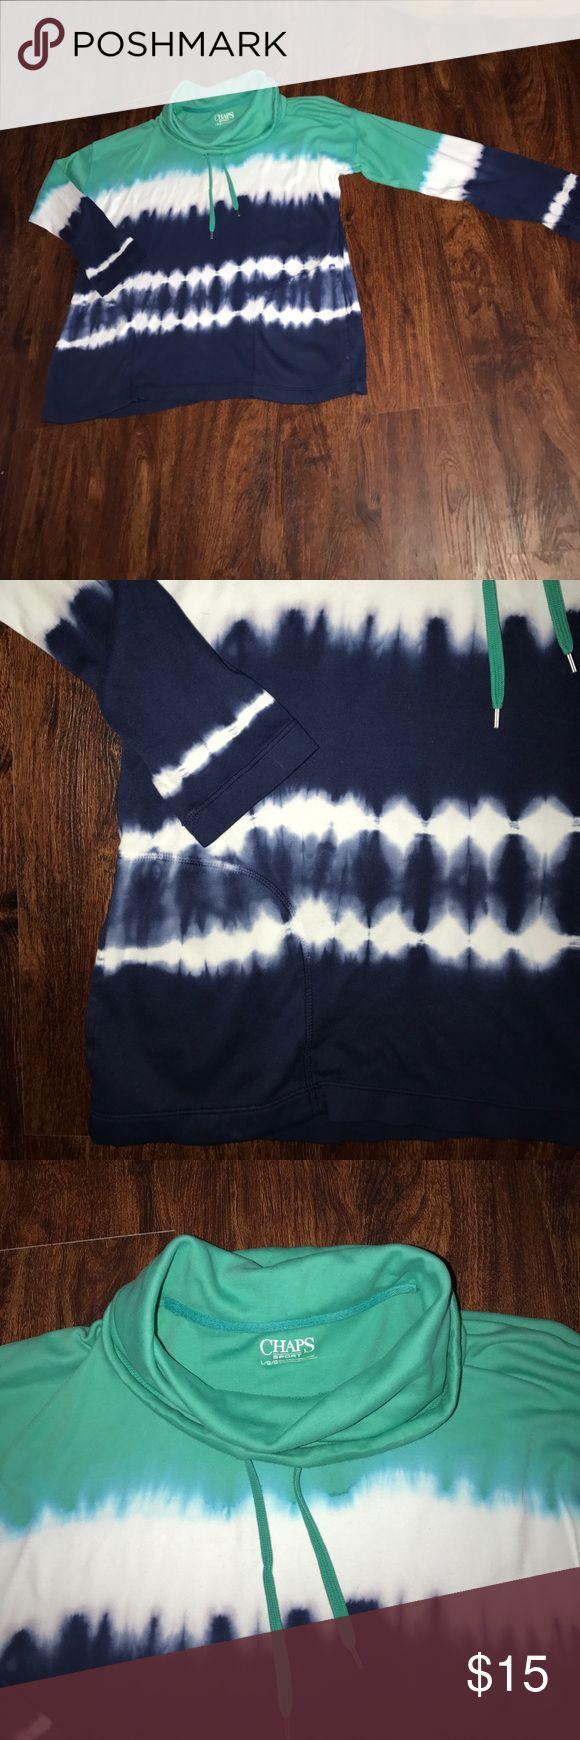 NWOT Tie-Dye Chaps Sport  cowl neck sweatshirt! Chaps Sport cowl neck sweatshirt! Pretty blue, aqua and white Tie-Dye pattern! Has 2 pockets! Super soft 100% Cotton! Never been worn! Women's size Large Chaps Tops Sweatshirts & Hoodies